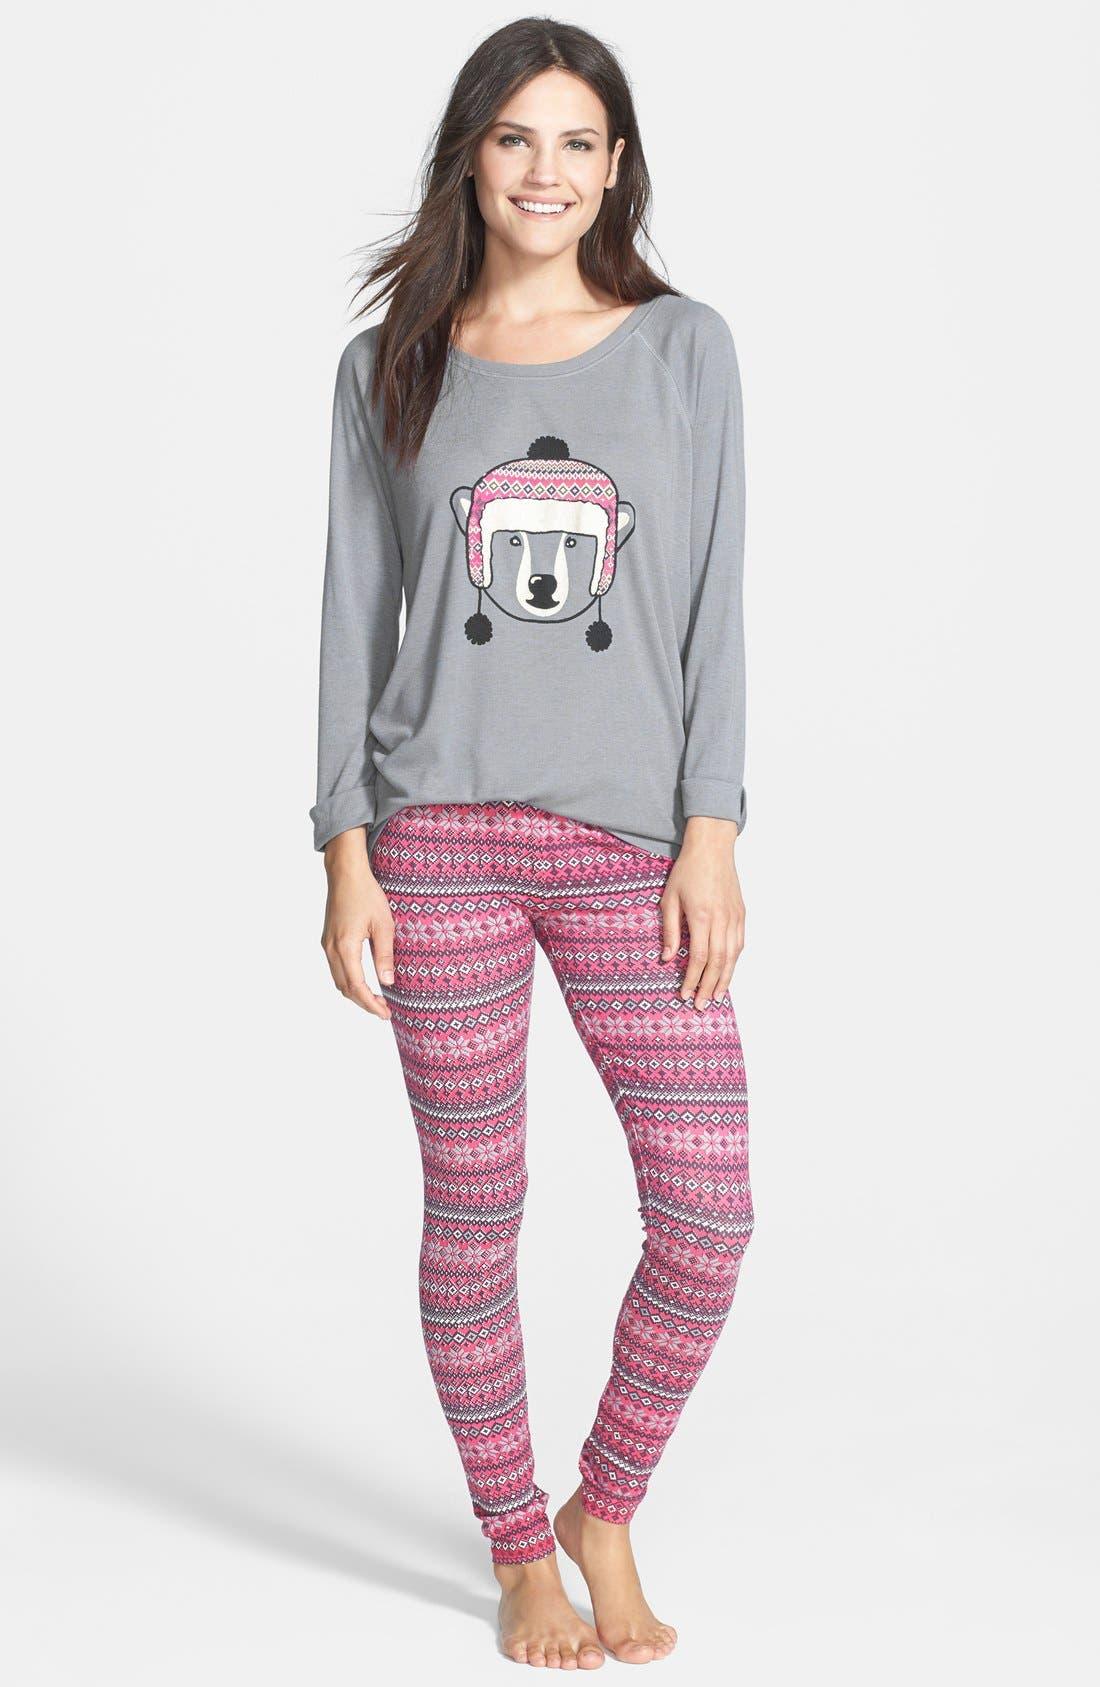 Main Image - Make + Model 'Lights Out' Pajamas